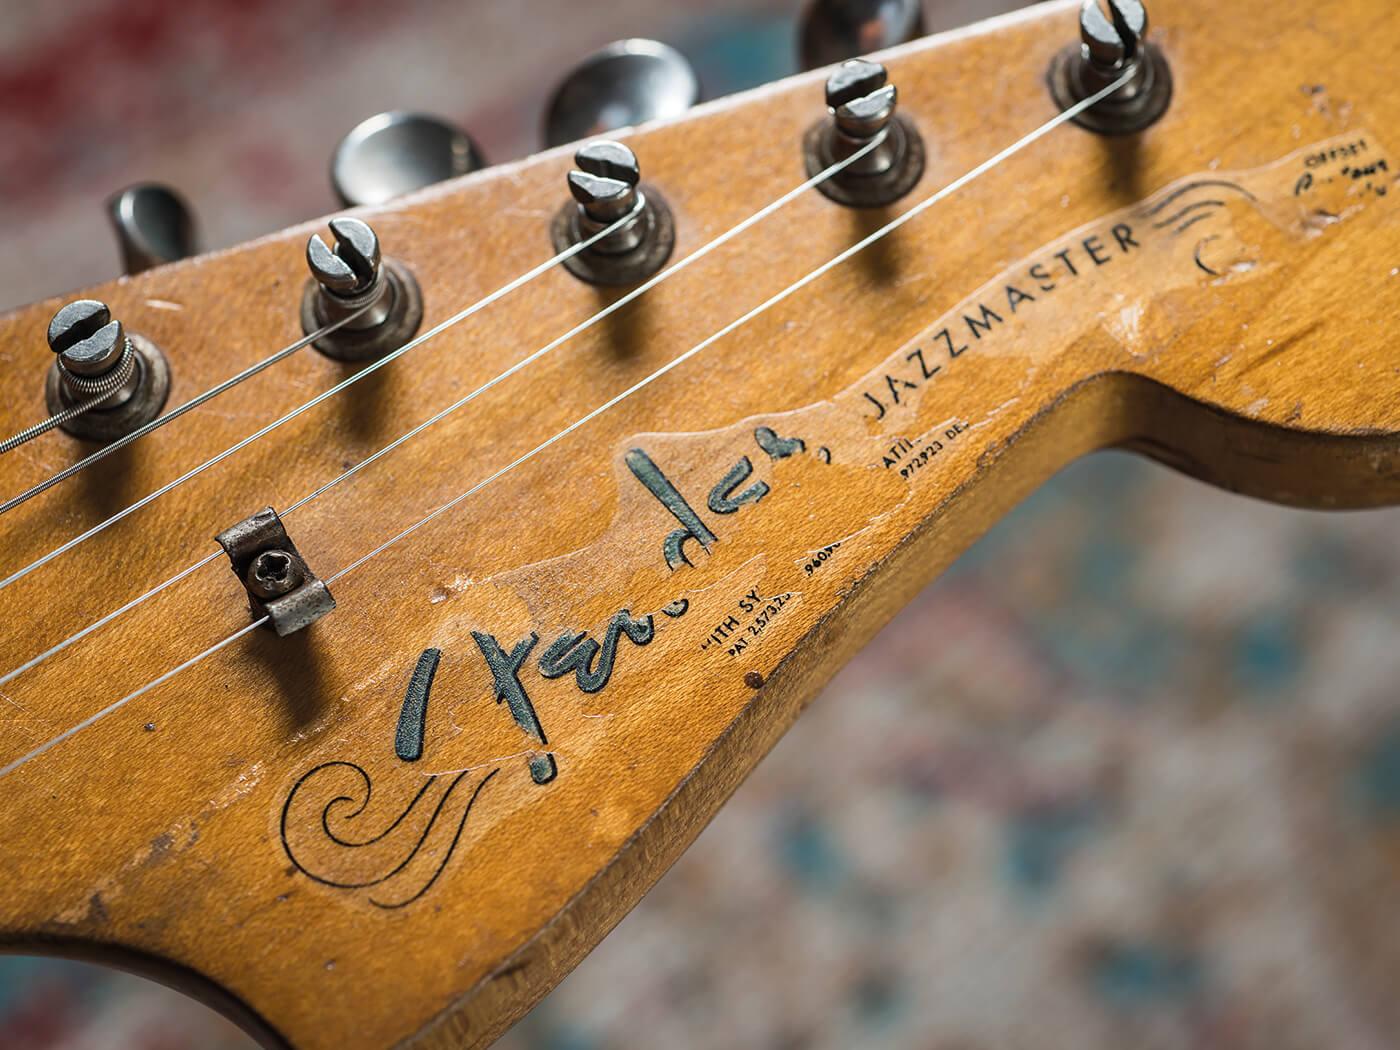 1962 Fender Jazzmaster aka 'Jazzy'